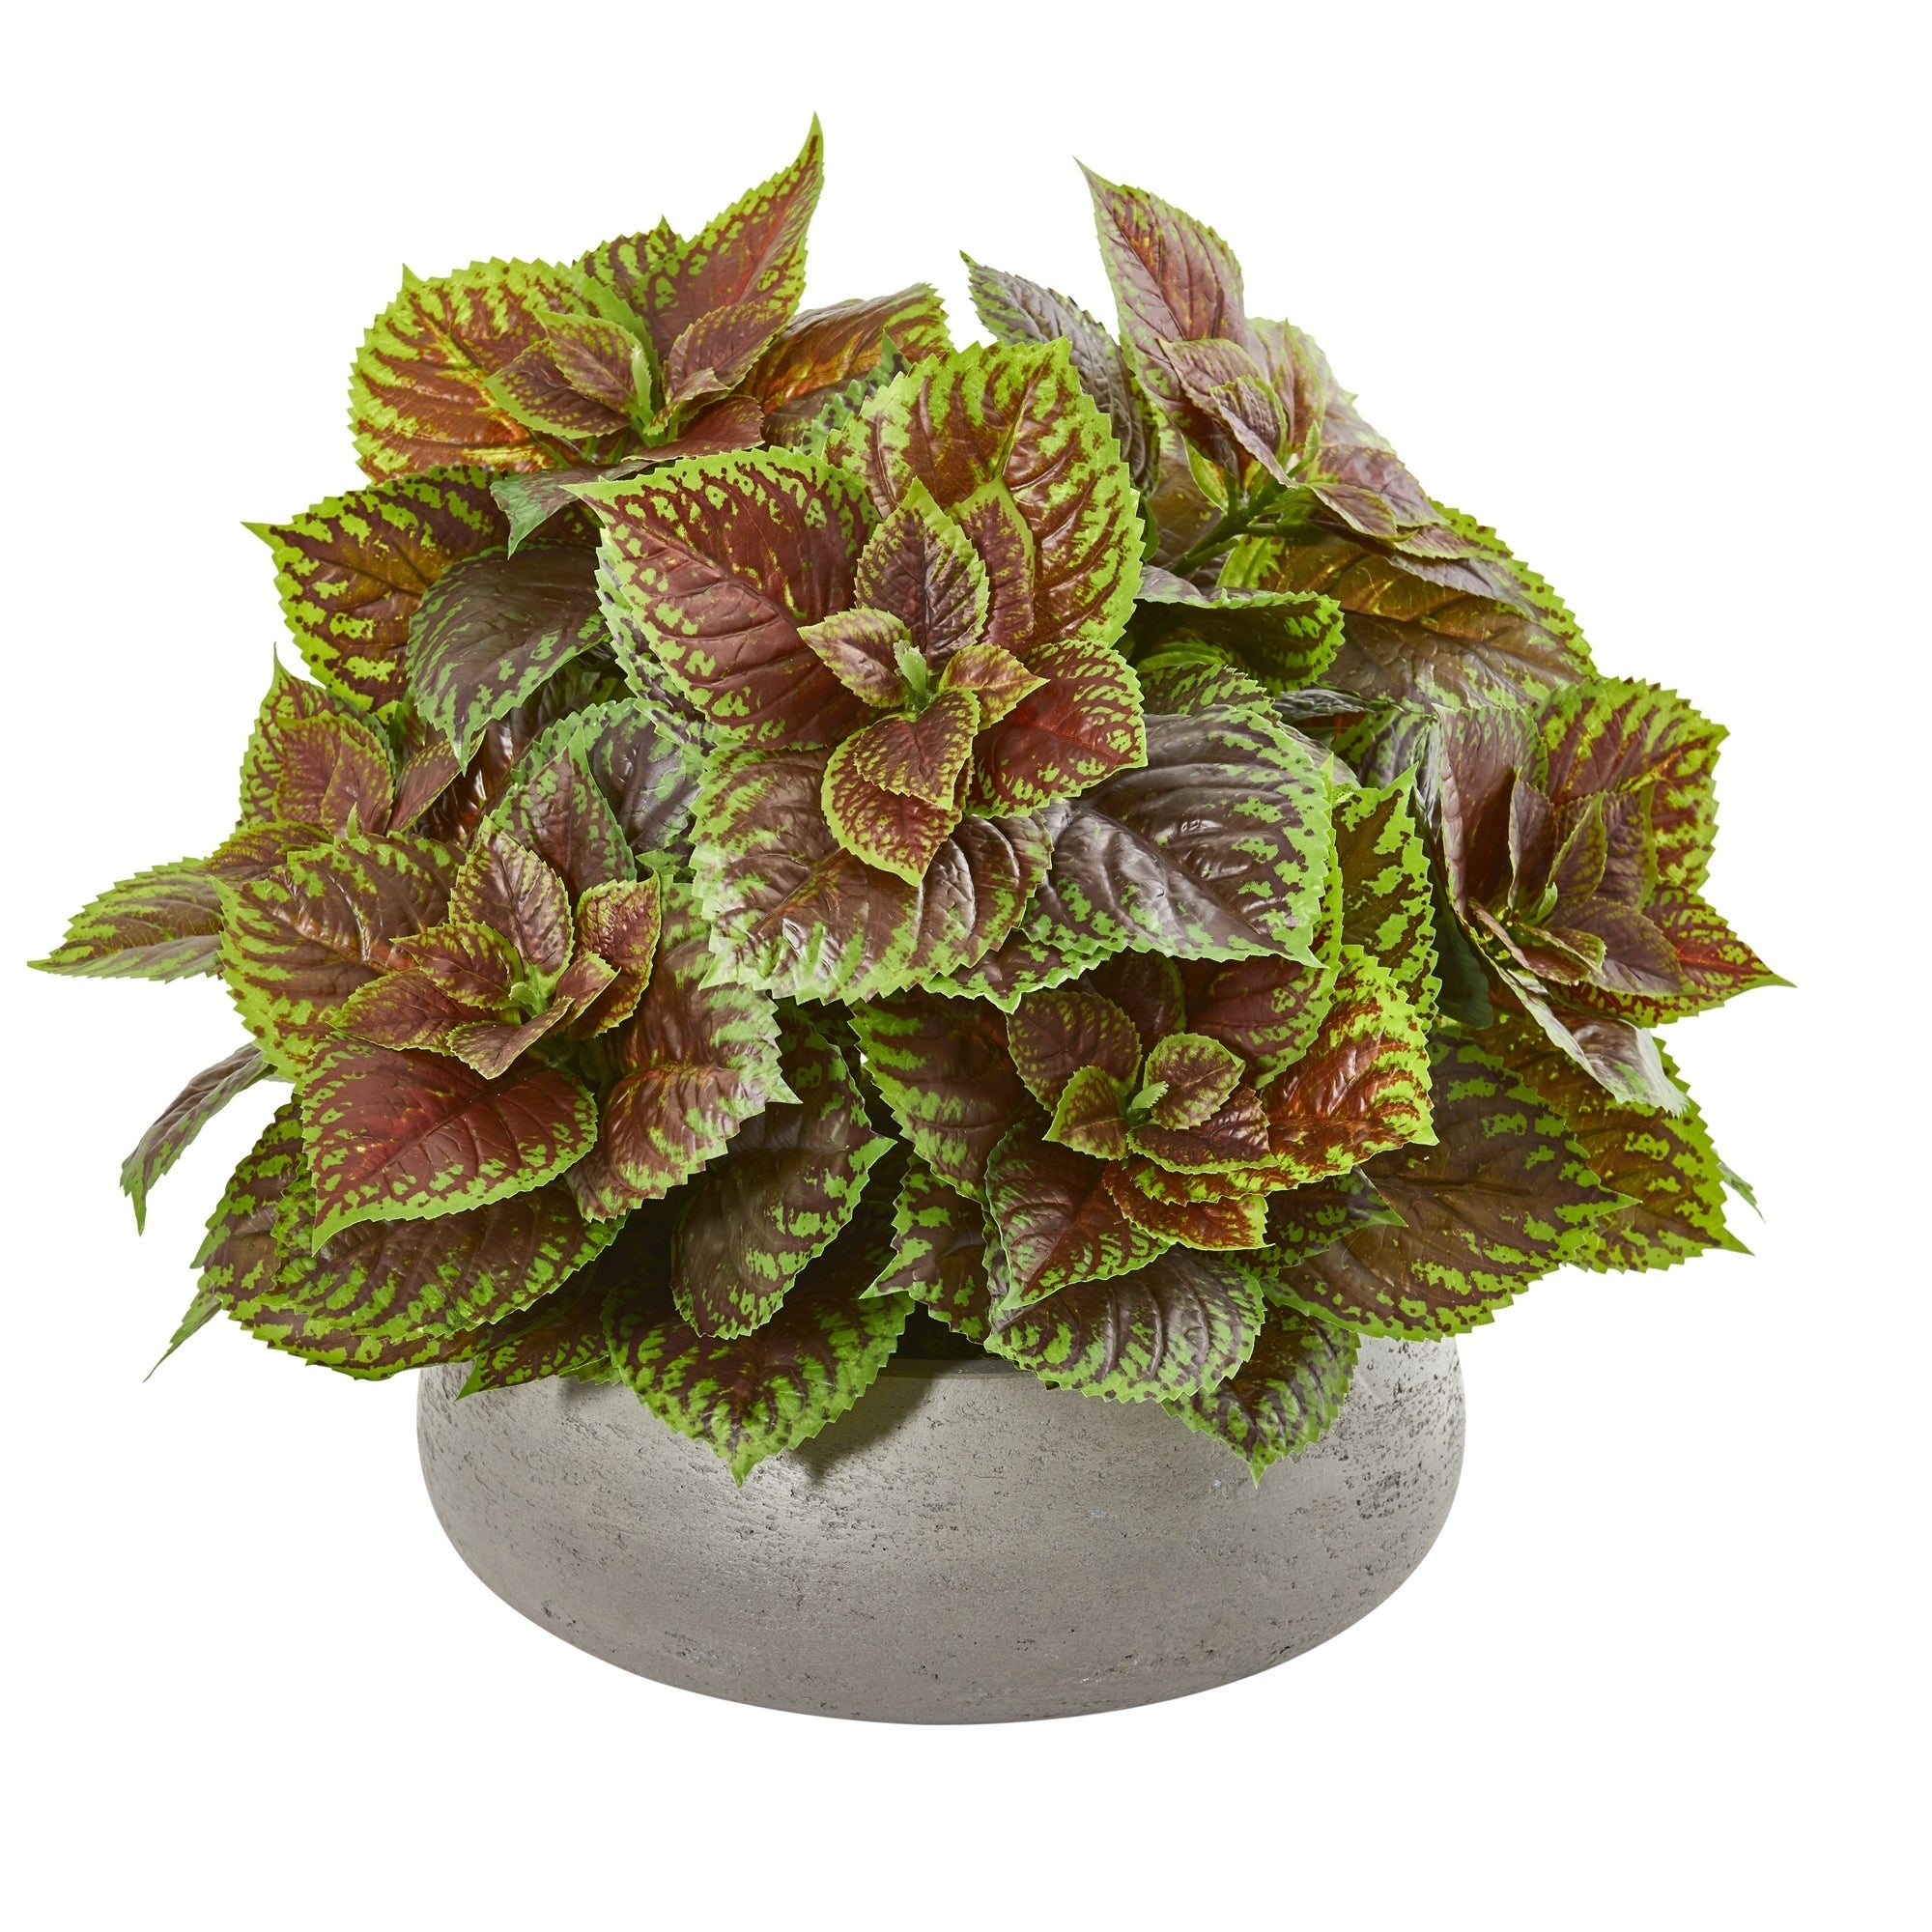 16 Coleus Artificial Plant in Decorative Planter (Real Touch)